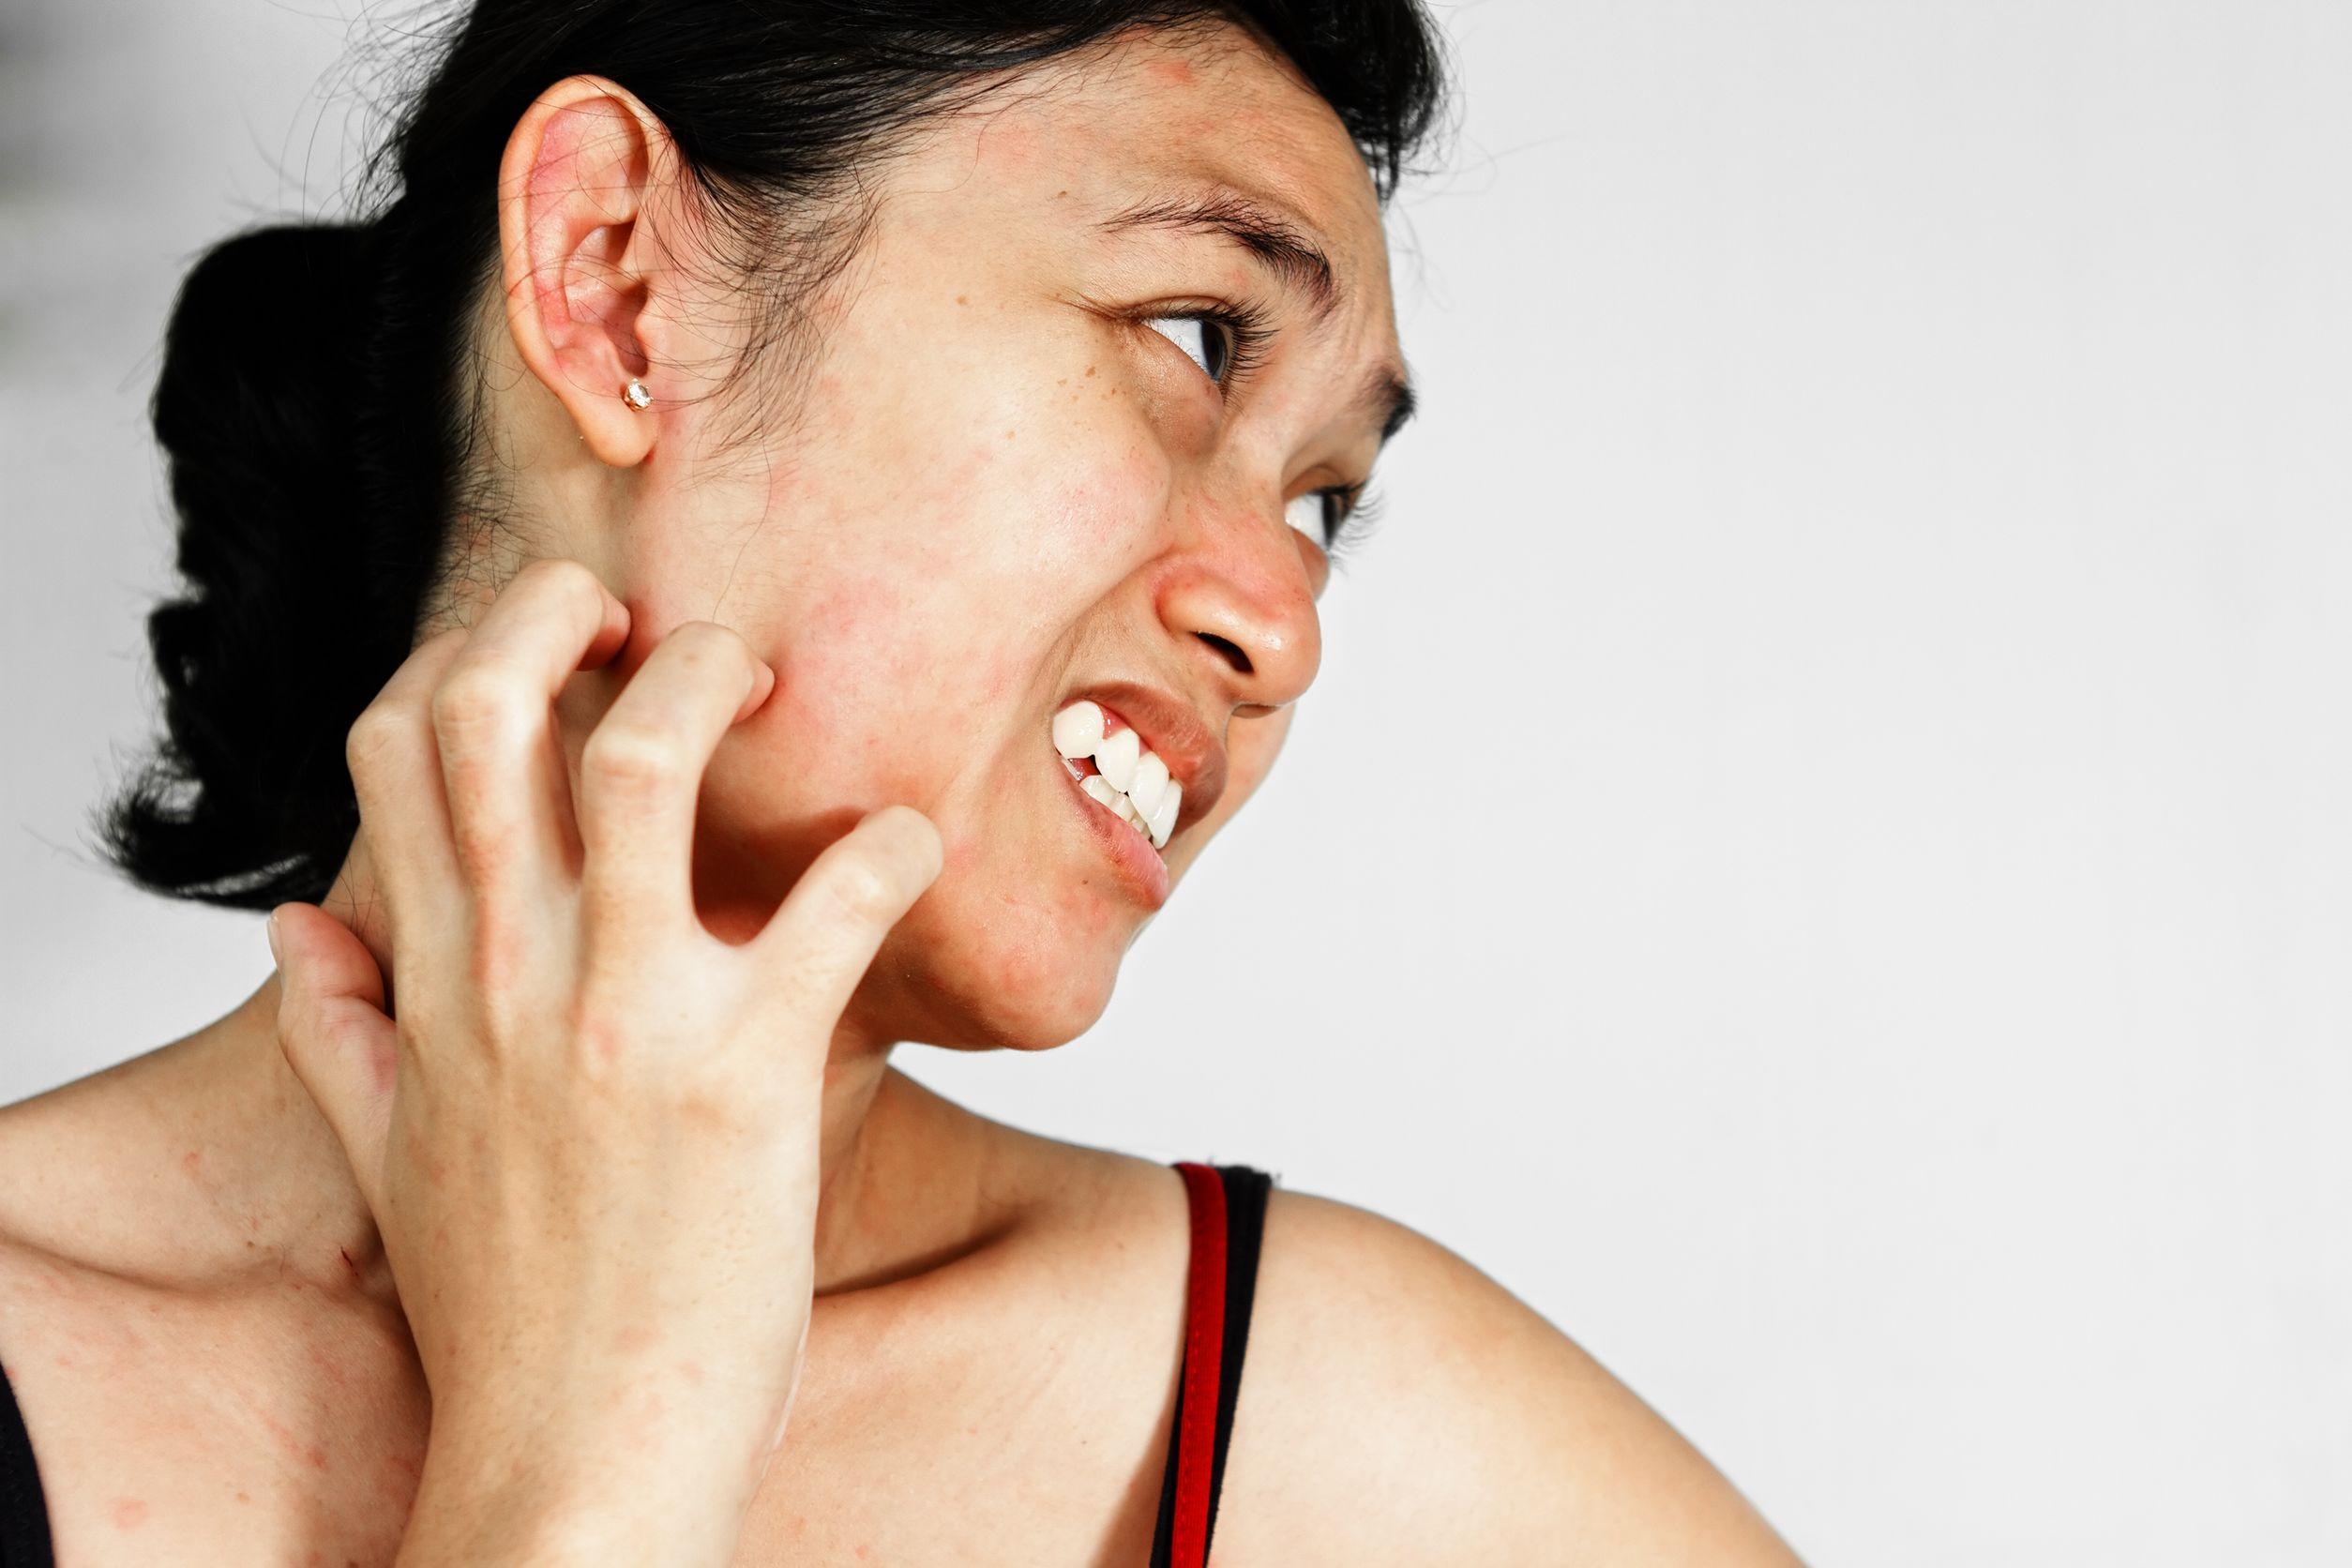 Beberapa Penyebab Wajah Jadi Berwarna Kemerahan